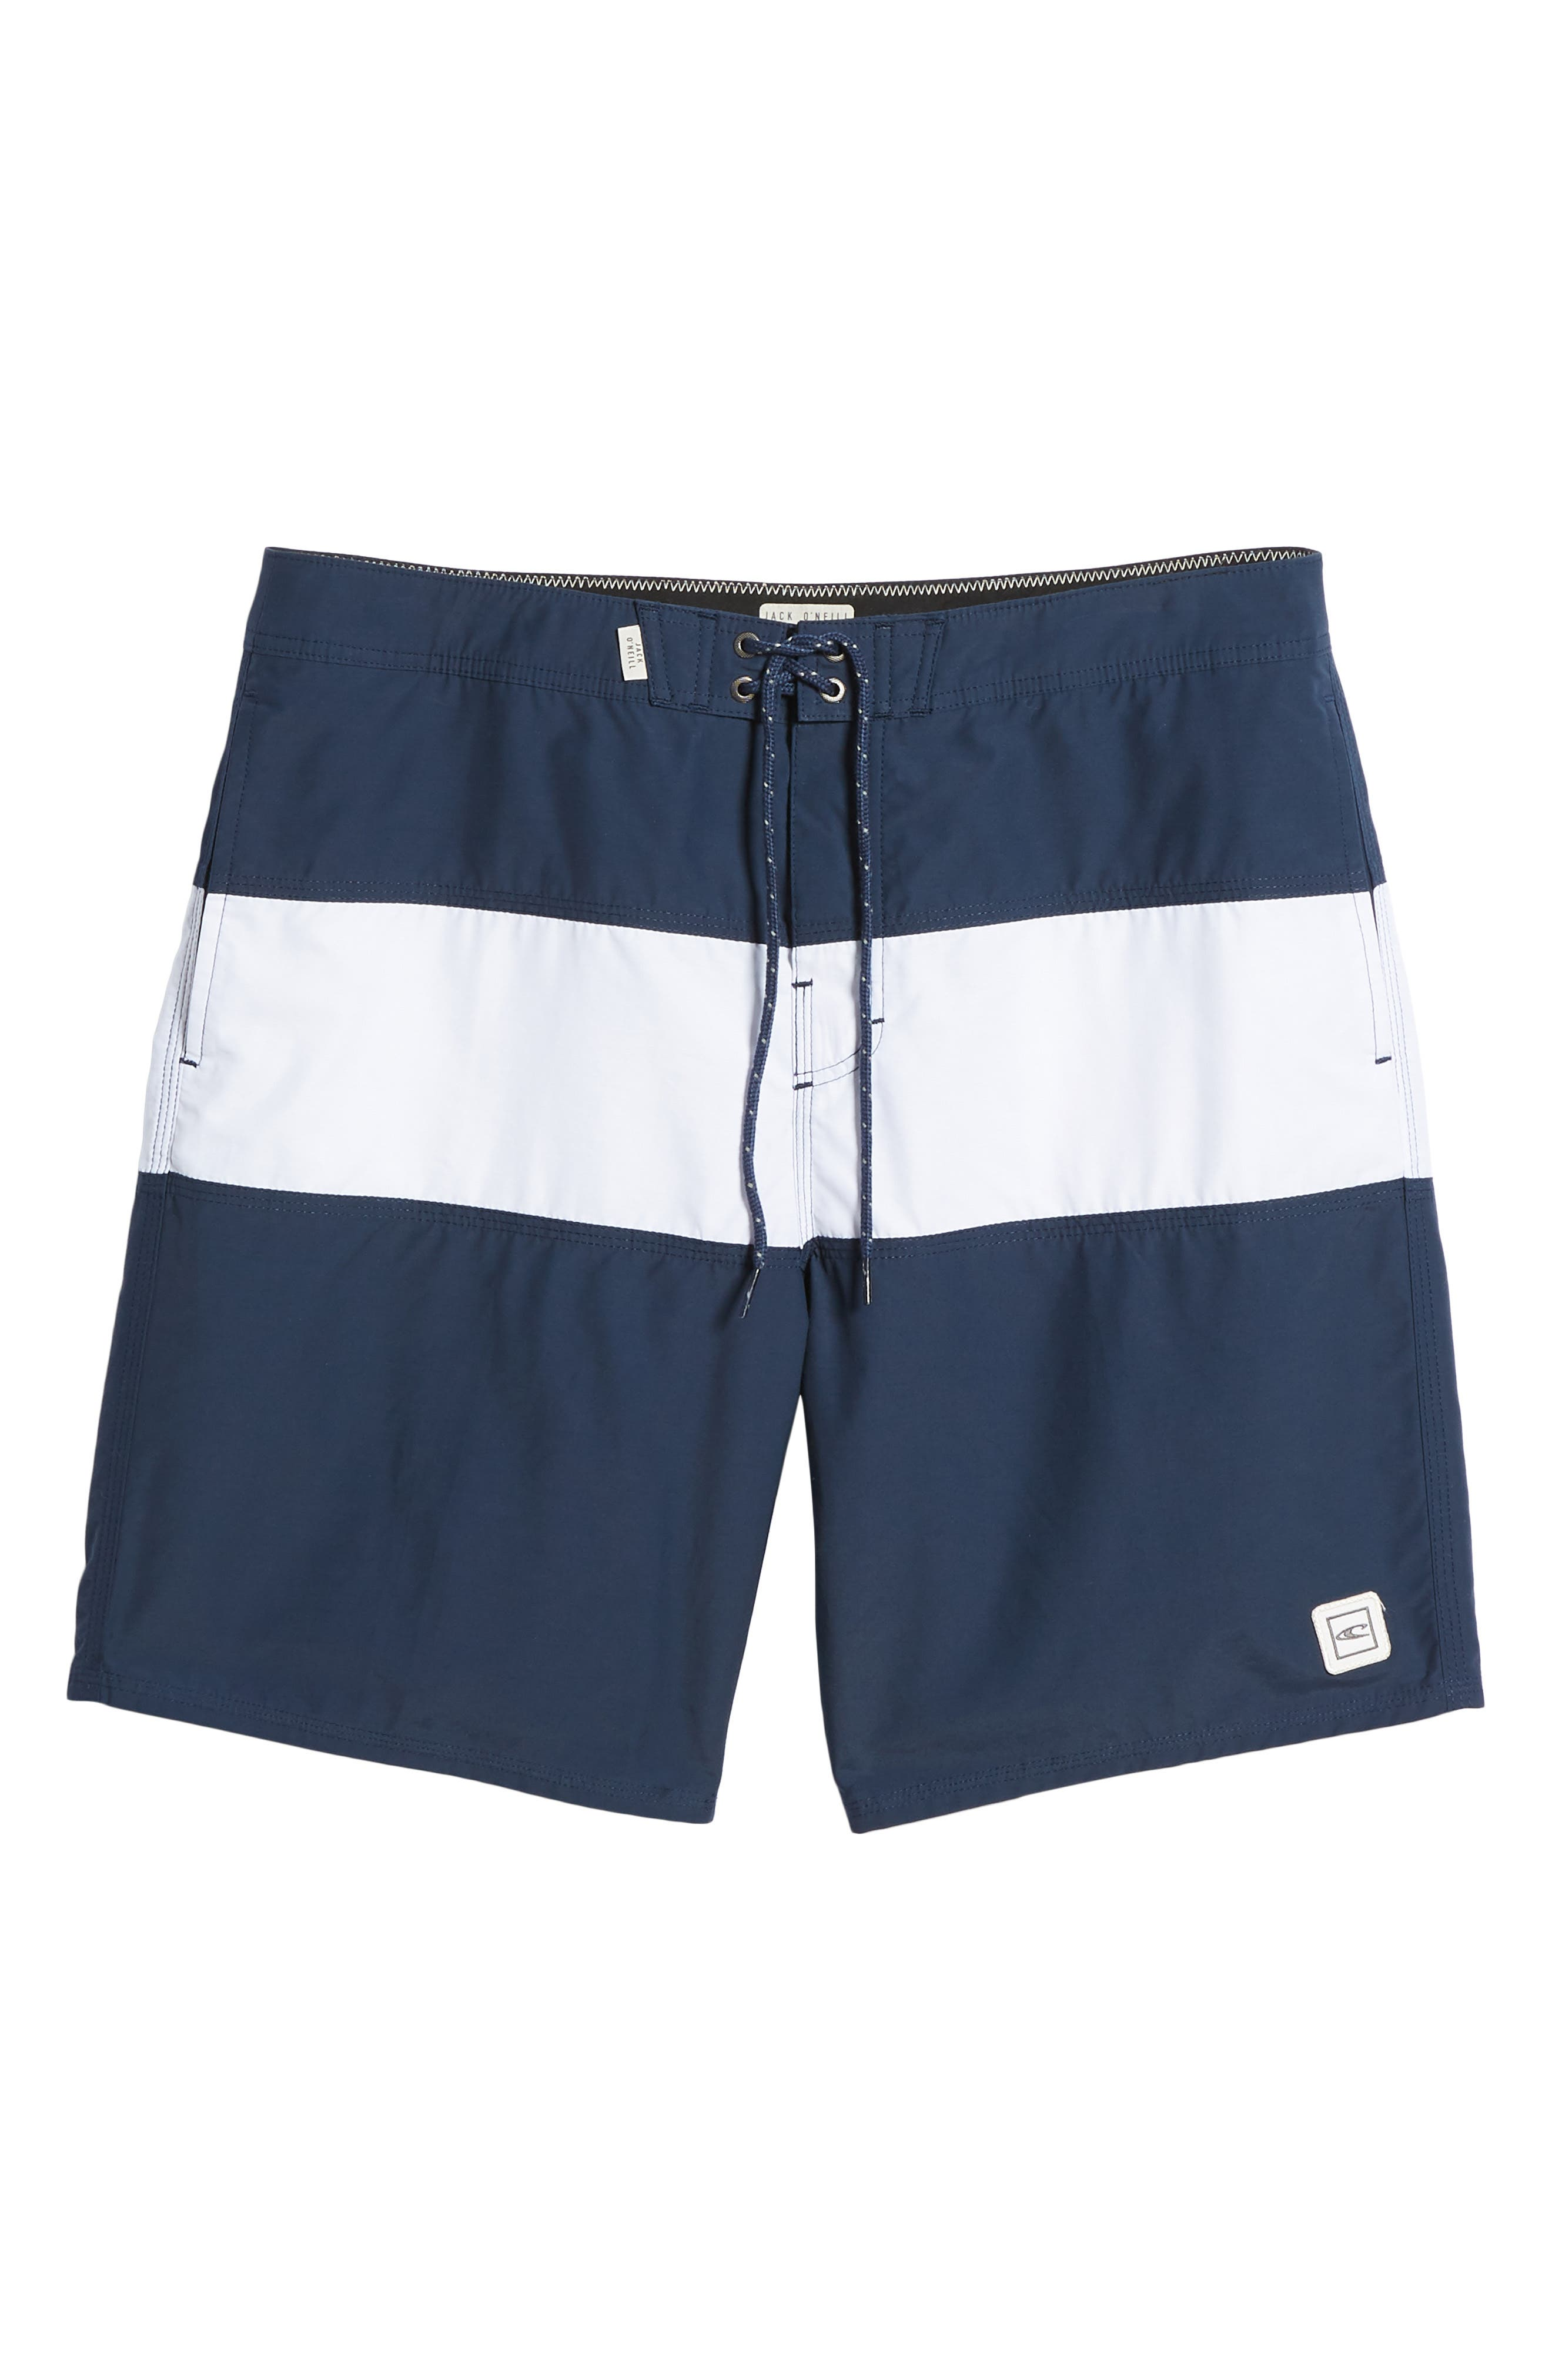 Heritage Board Shorts,                             Alternate thumbnail 6, color,                             Navy